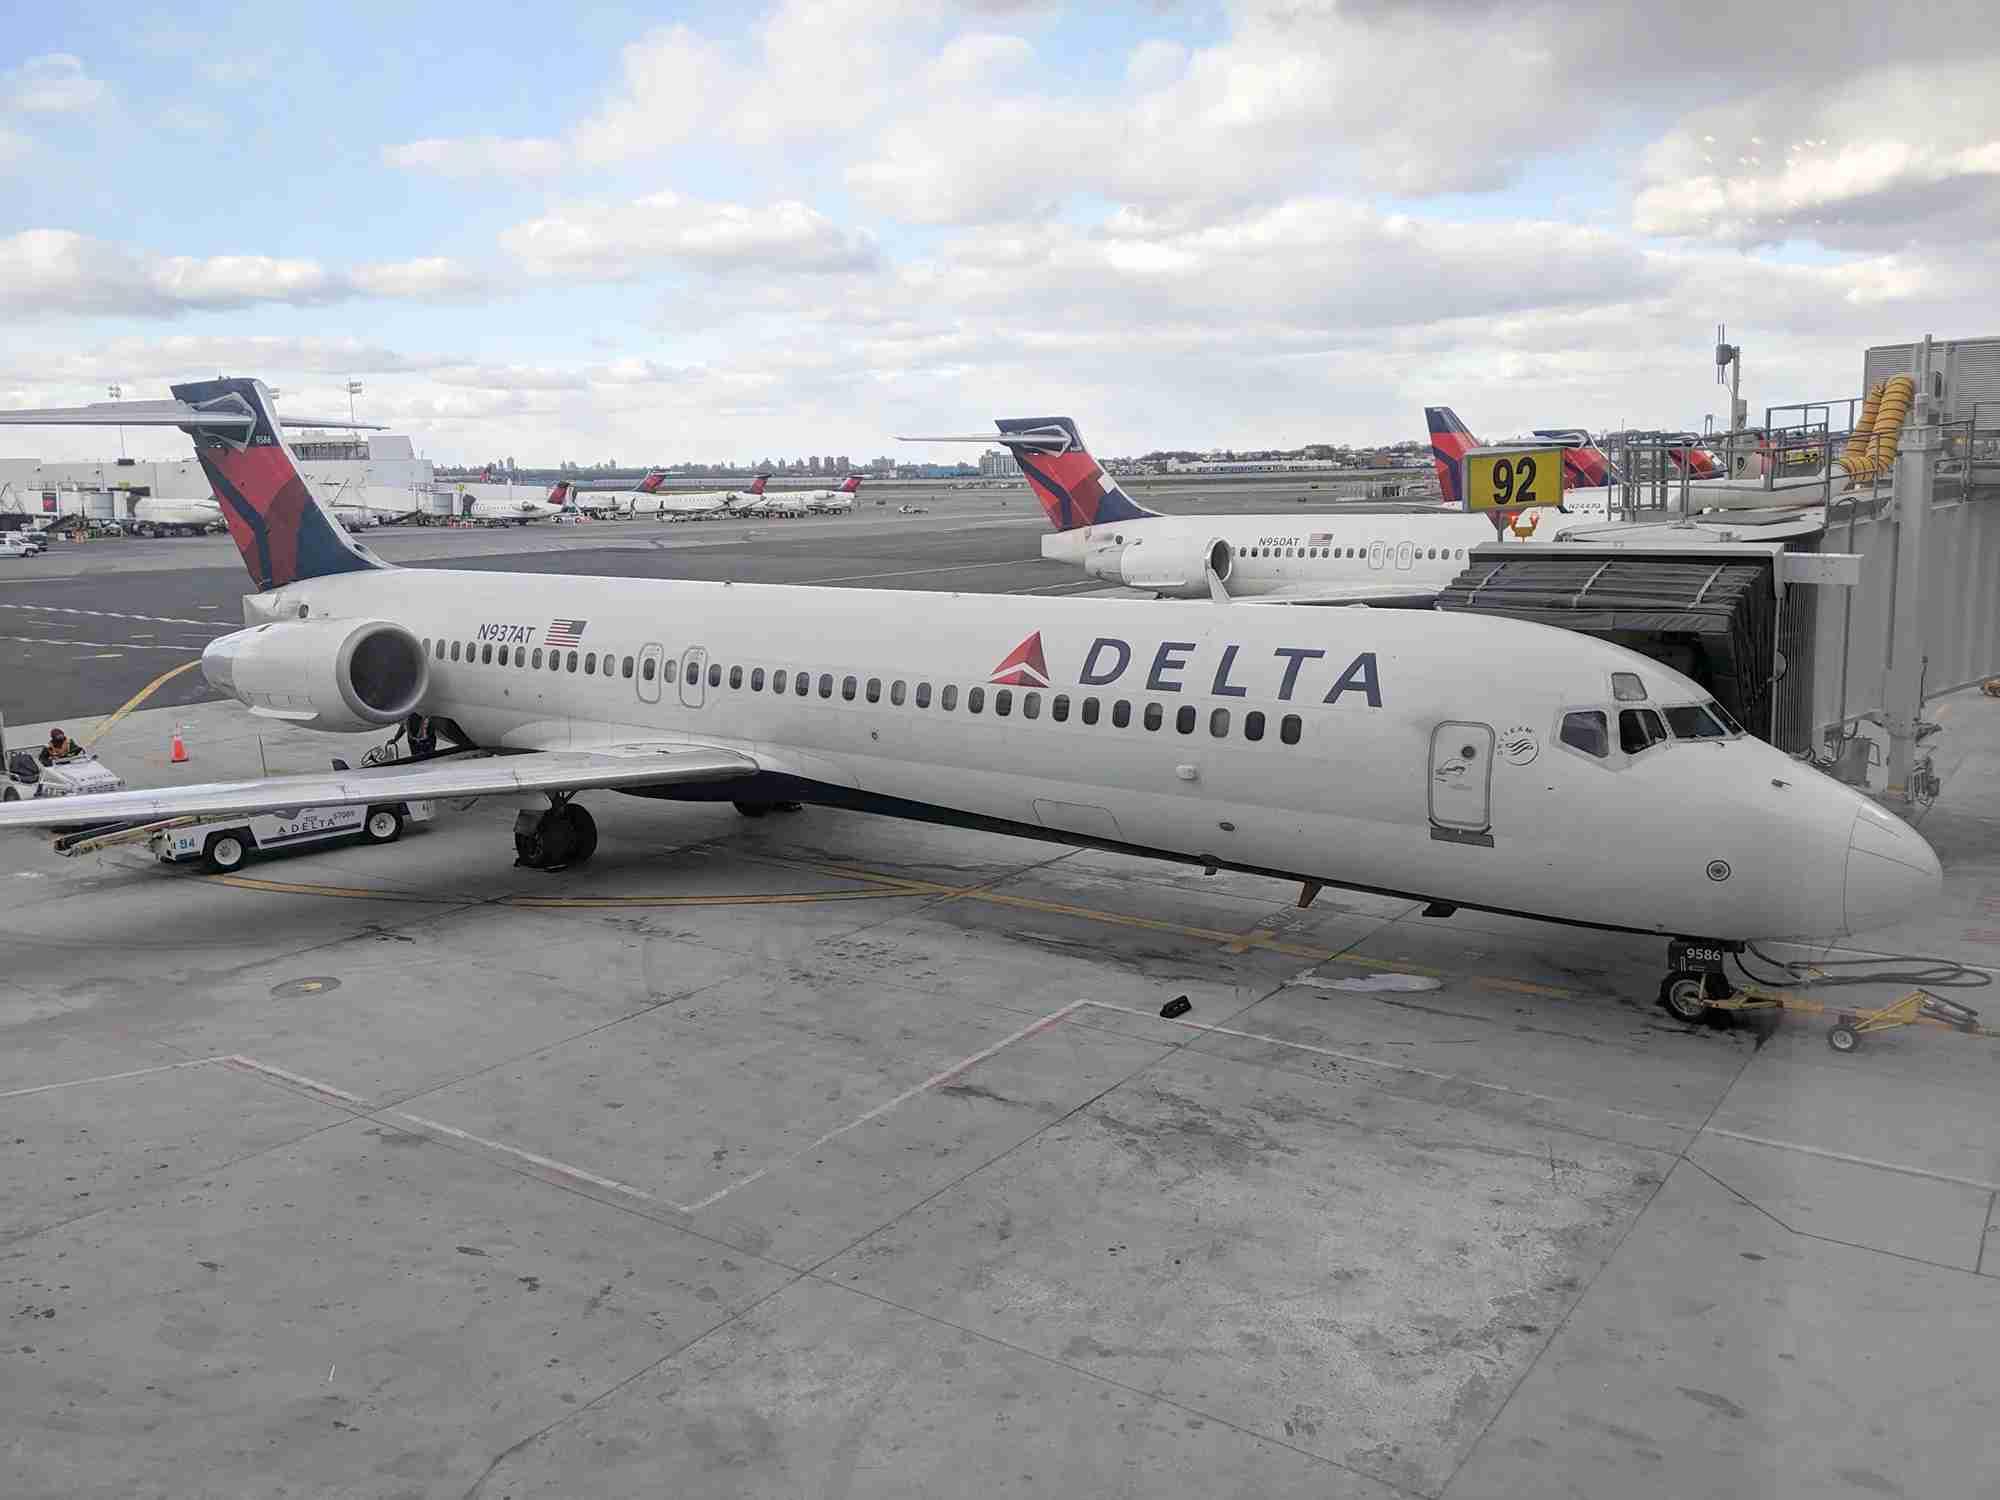 A Delta 717 at New York LaGuardia. (Photo by Alberto Riva/The Points Guy)